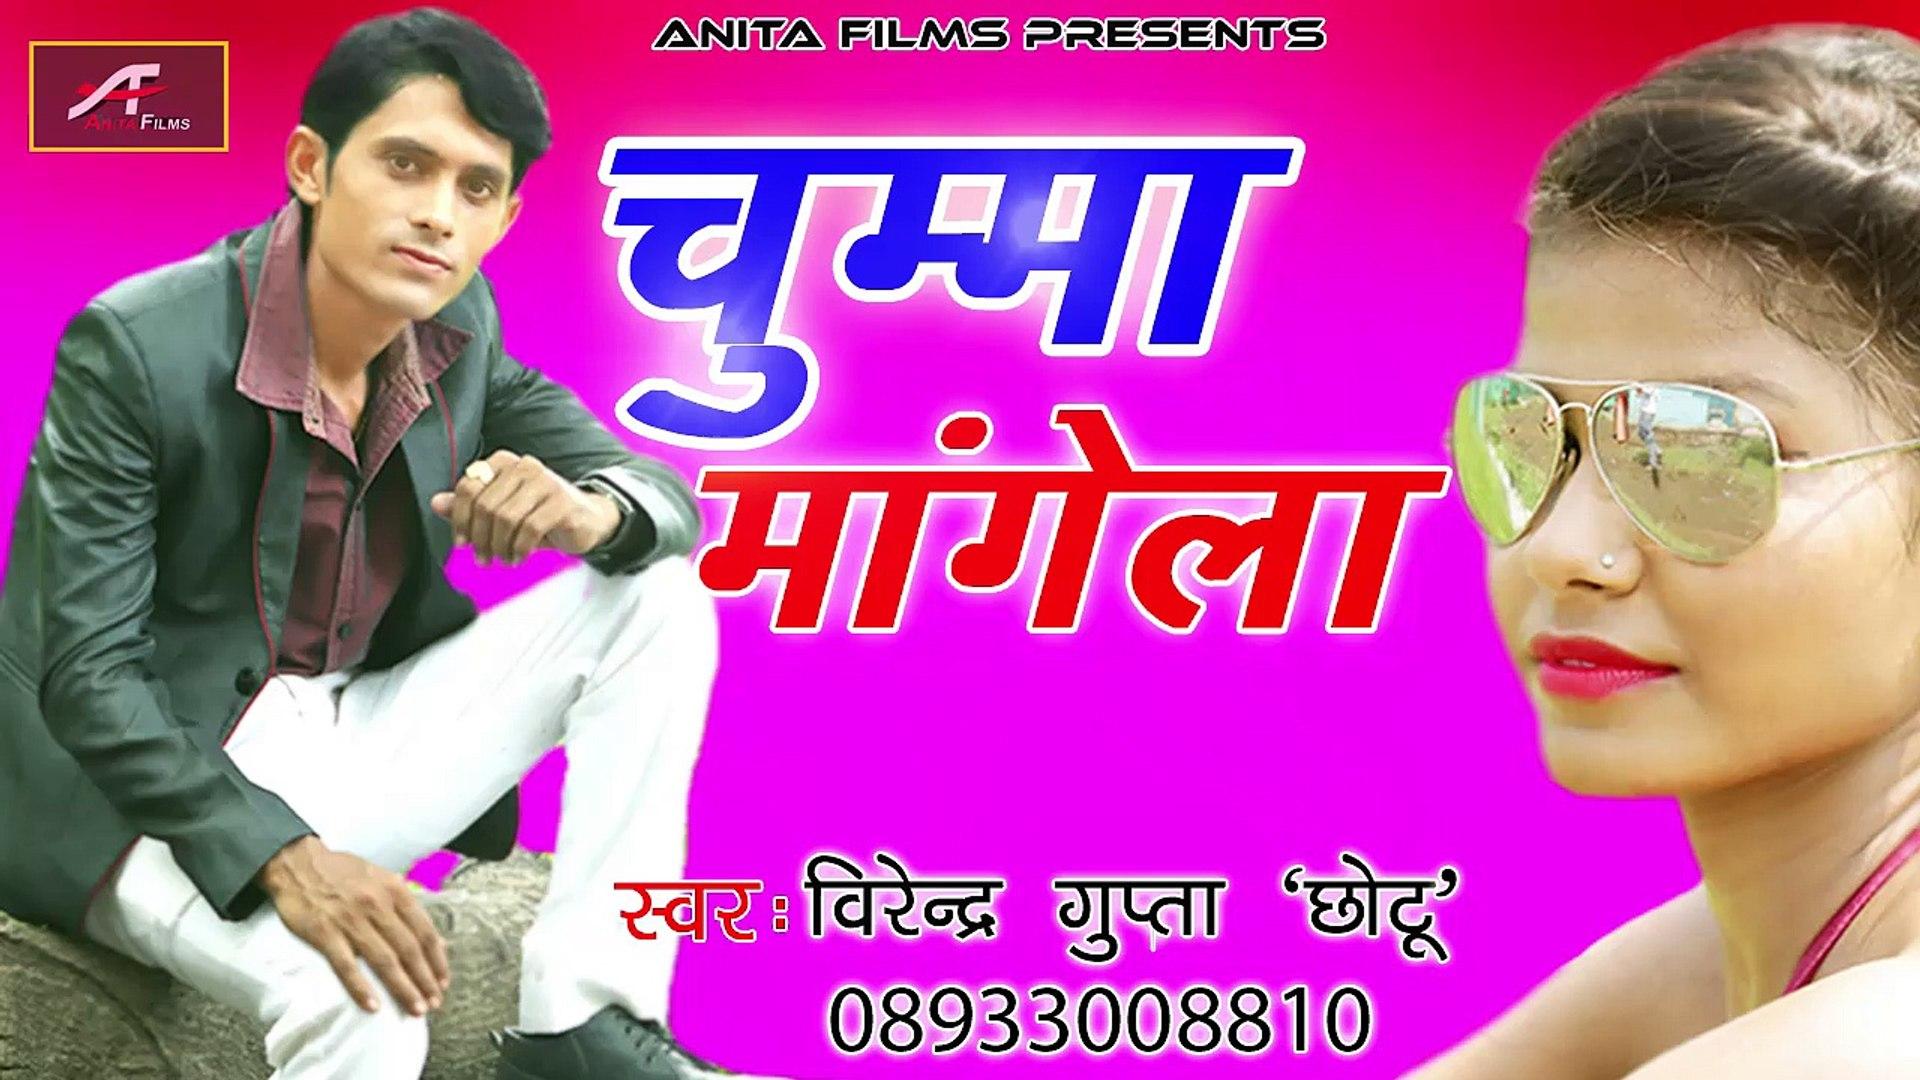 Bhojpuri Song | Chumma Mangela (FULL Song) | Virender Gupta Chotu New Album Song | Latest 2017- 2018